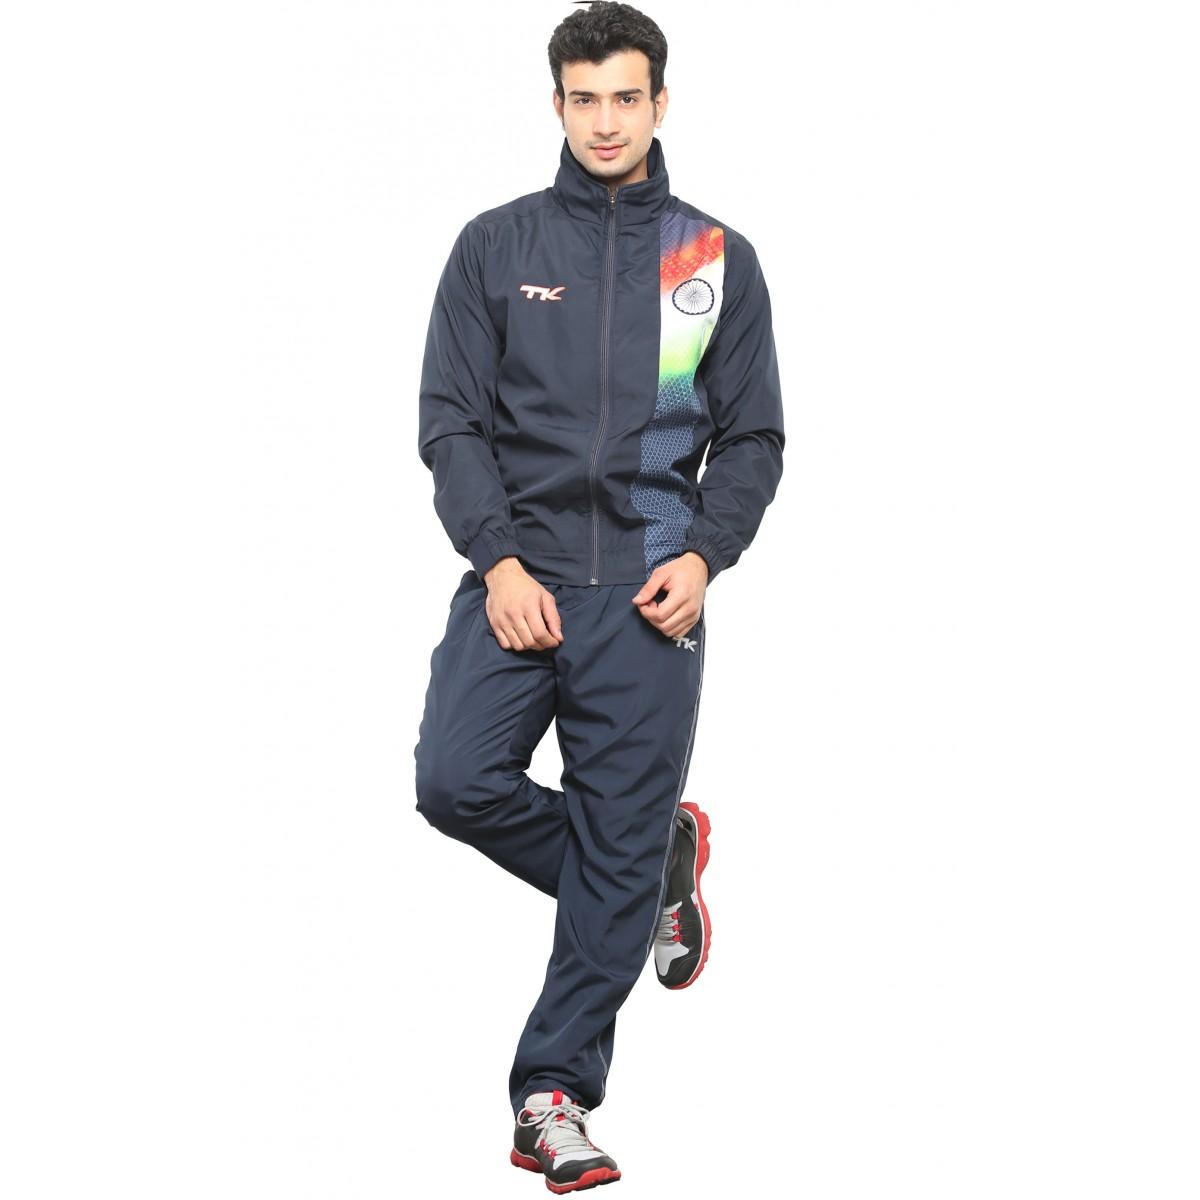 atom track suit PNCJVRB